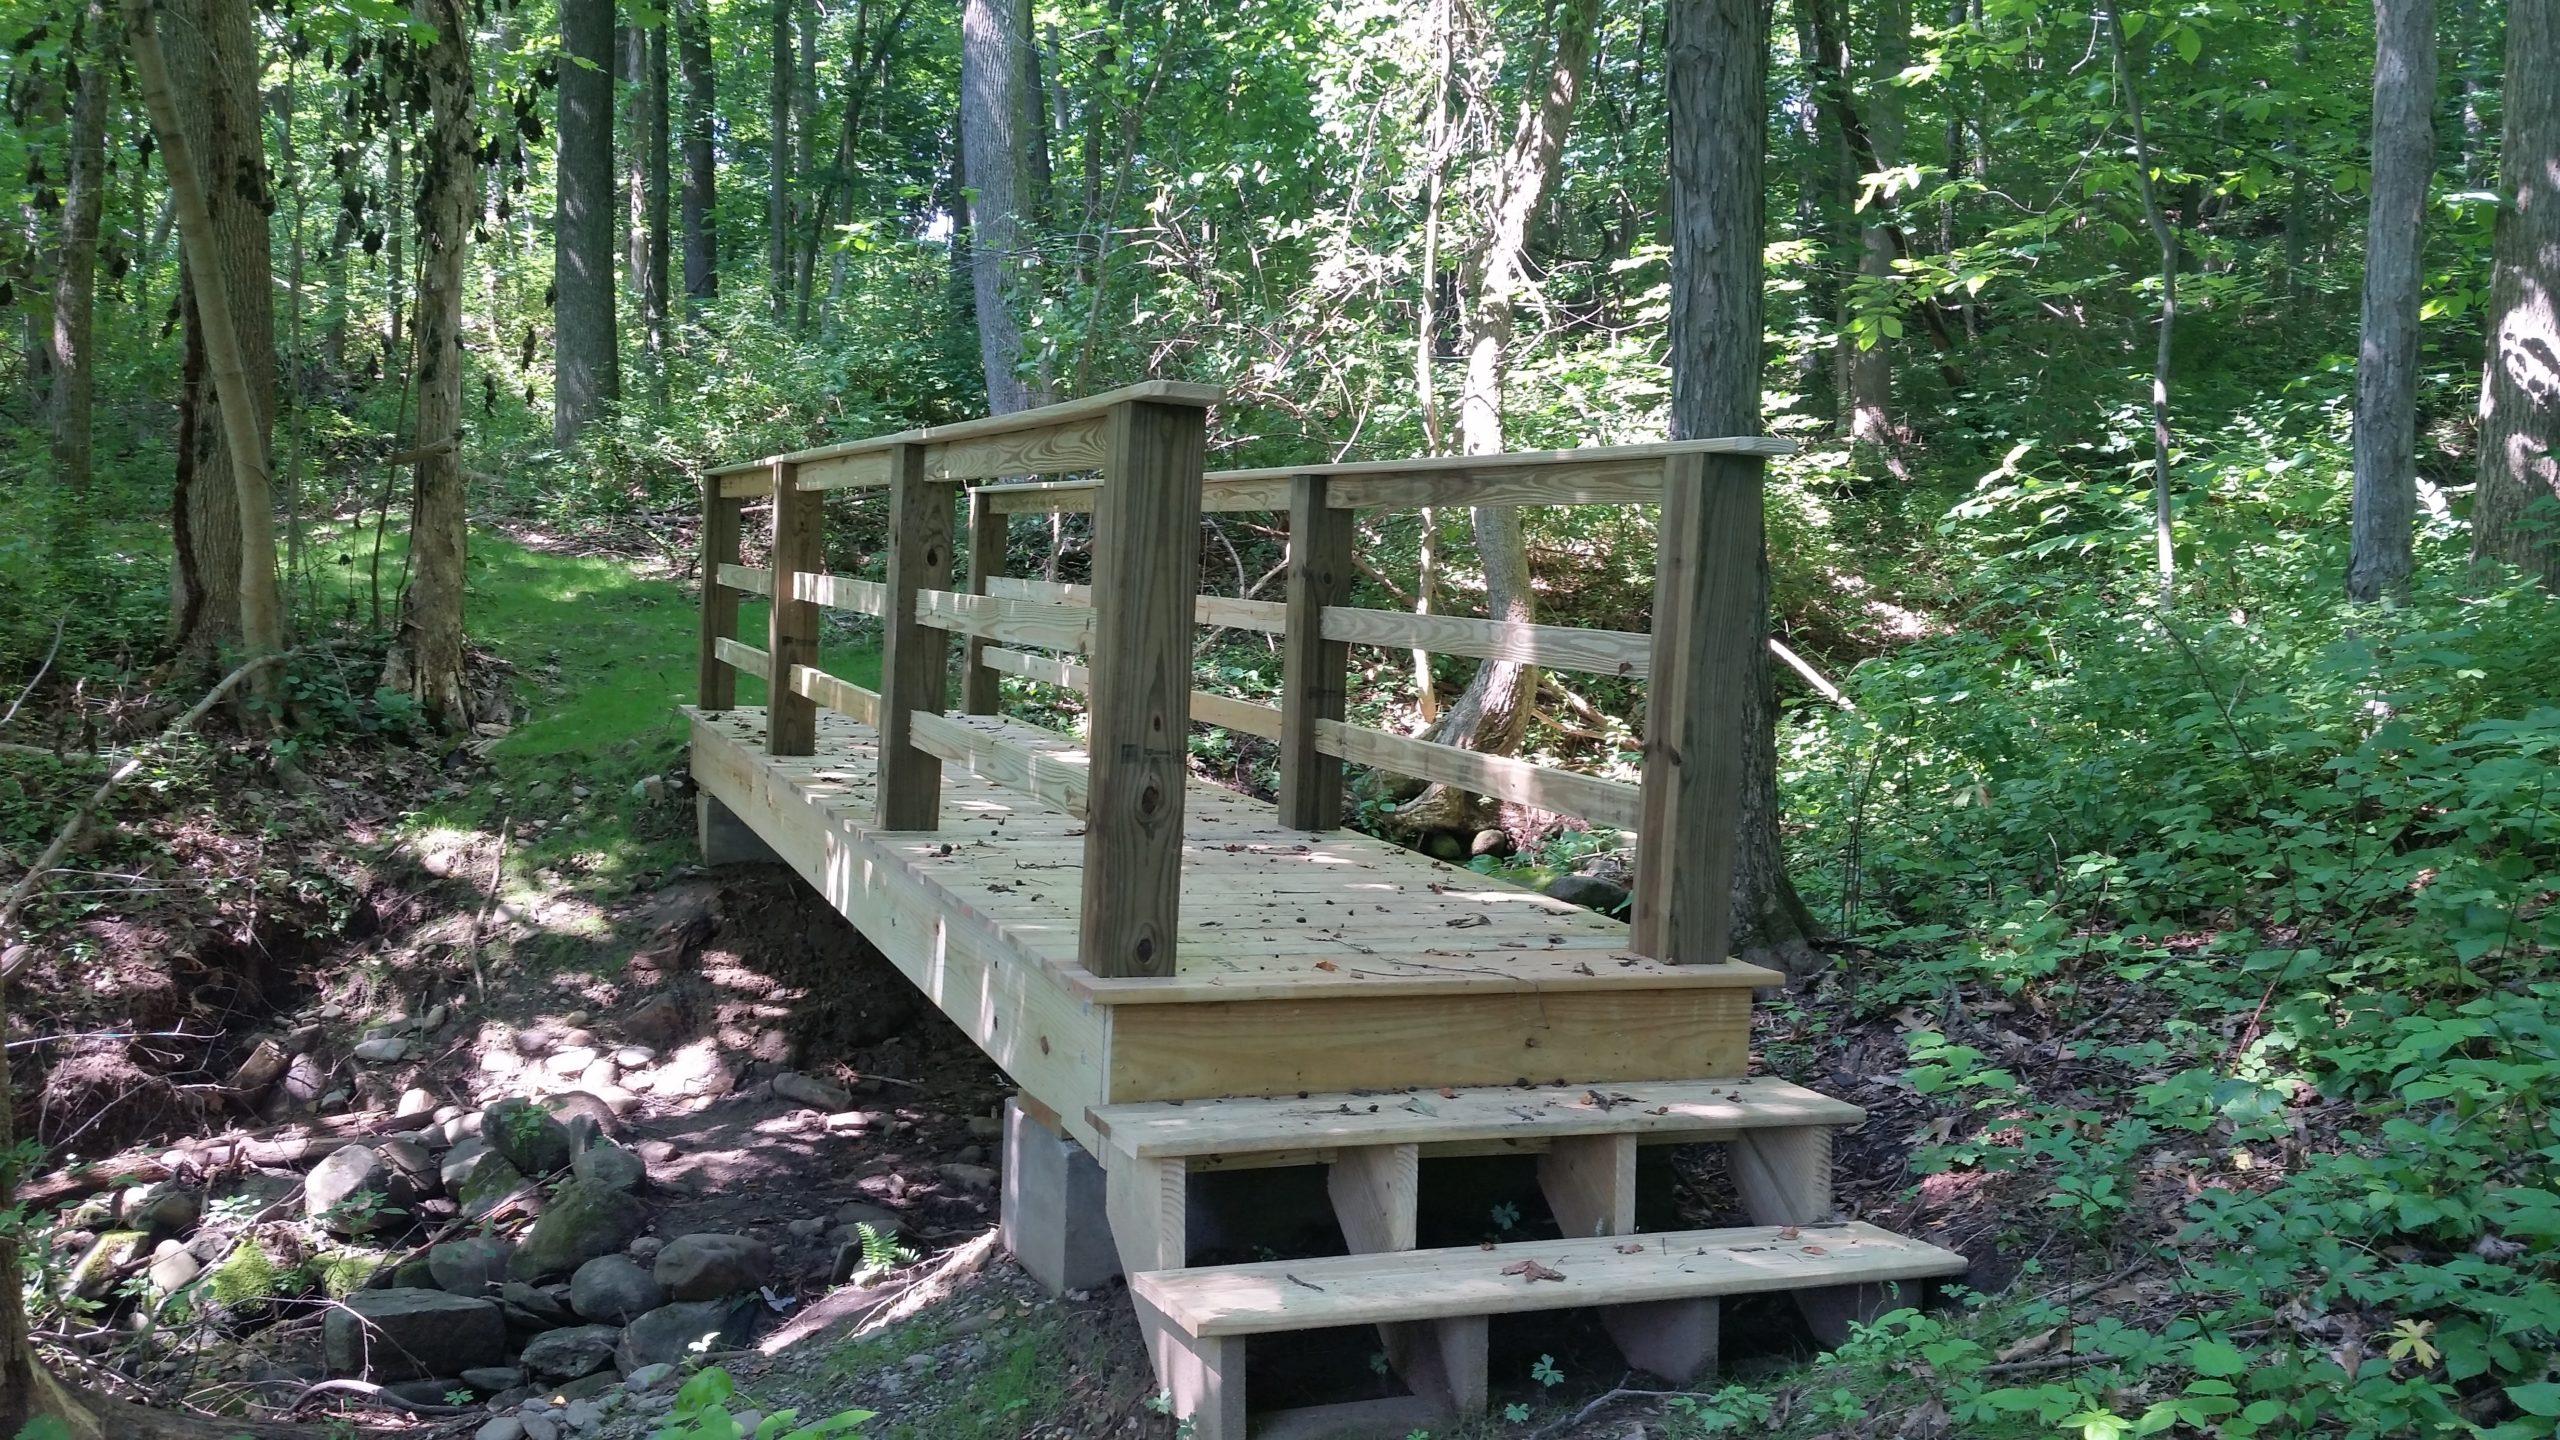 https://www.auburnguide.com/368/Pakachoag-Hiking-Trail